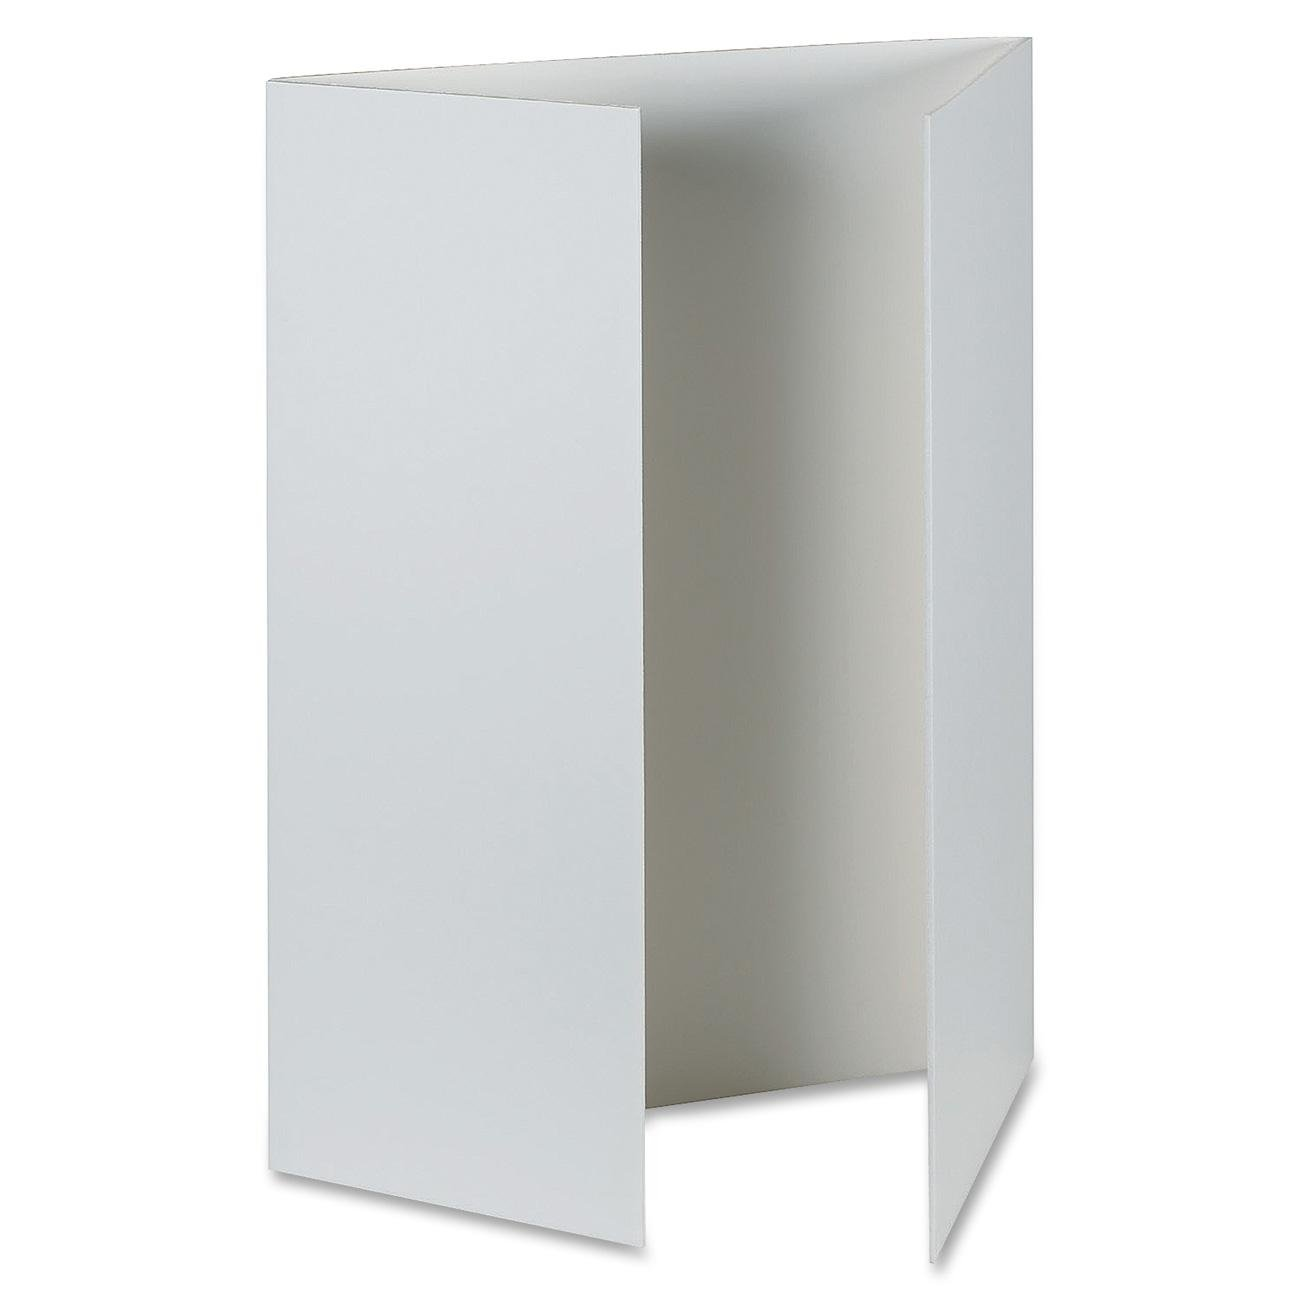 Pacon Corporation Presentation Foam Board, Tri-Fold, 48X36, 6/Ct, White 48X36 PAC38636